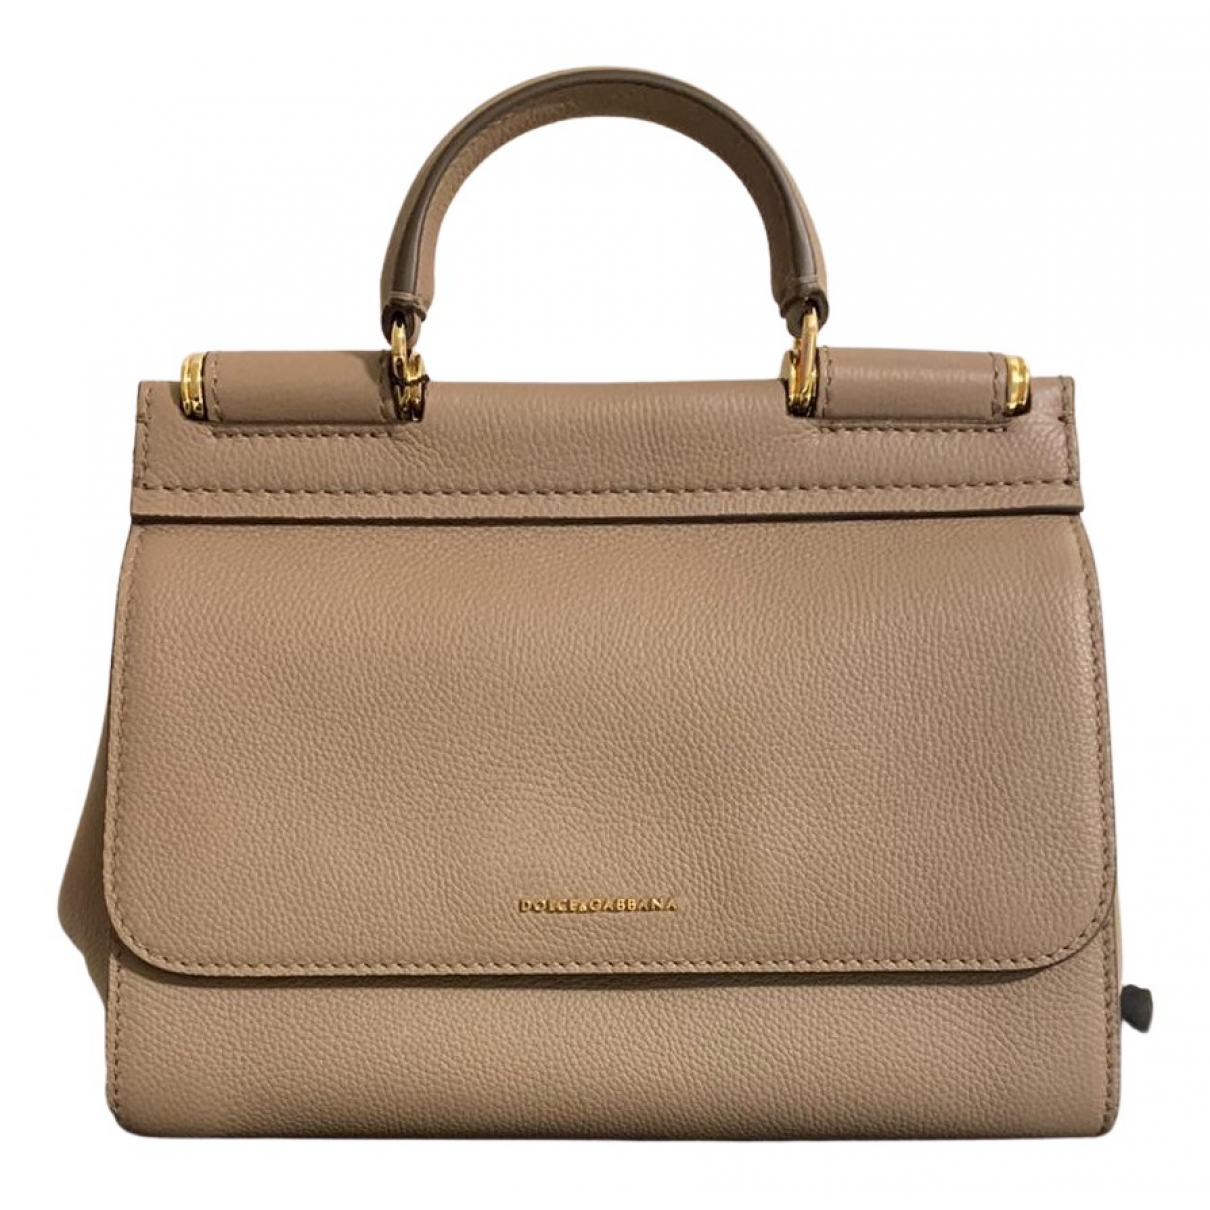 Dolce & Gabbana Sicily Beige Leather handbag for Women N